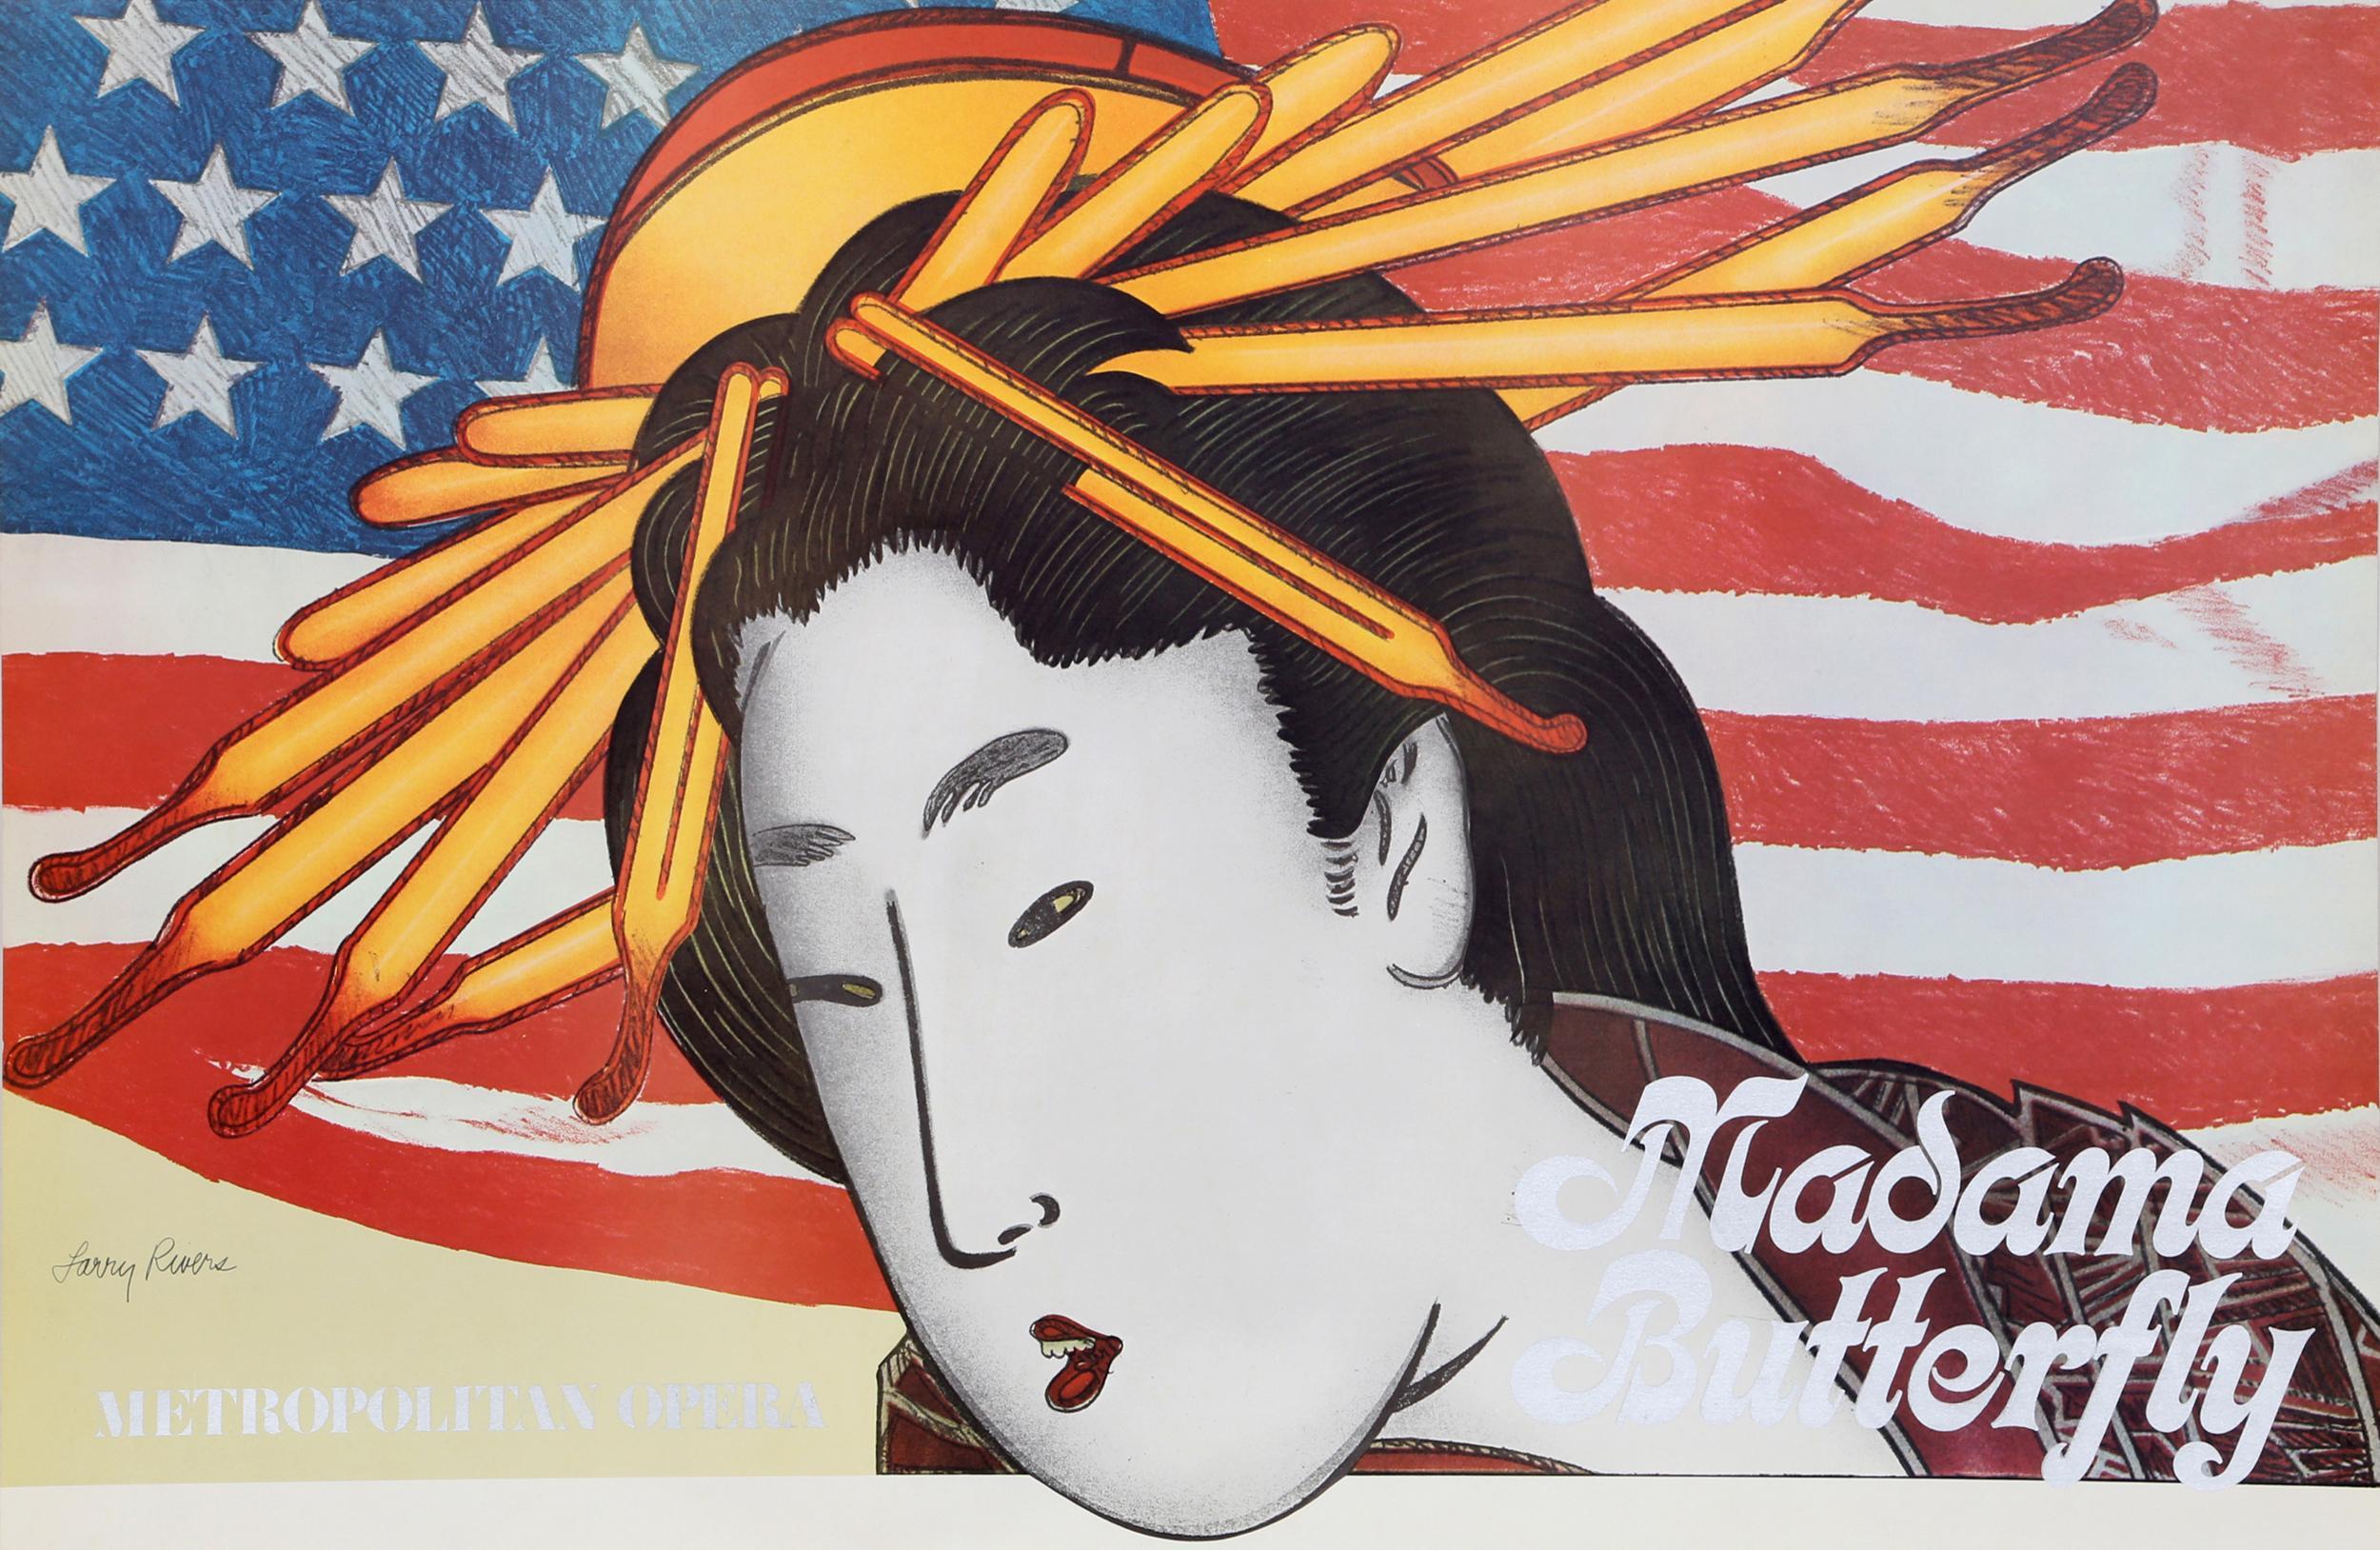 Larry Rivers, Metropolitan Opera - Madama Butterfly, Poster